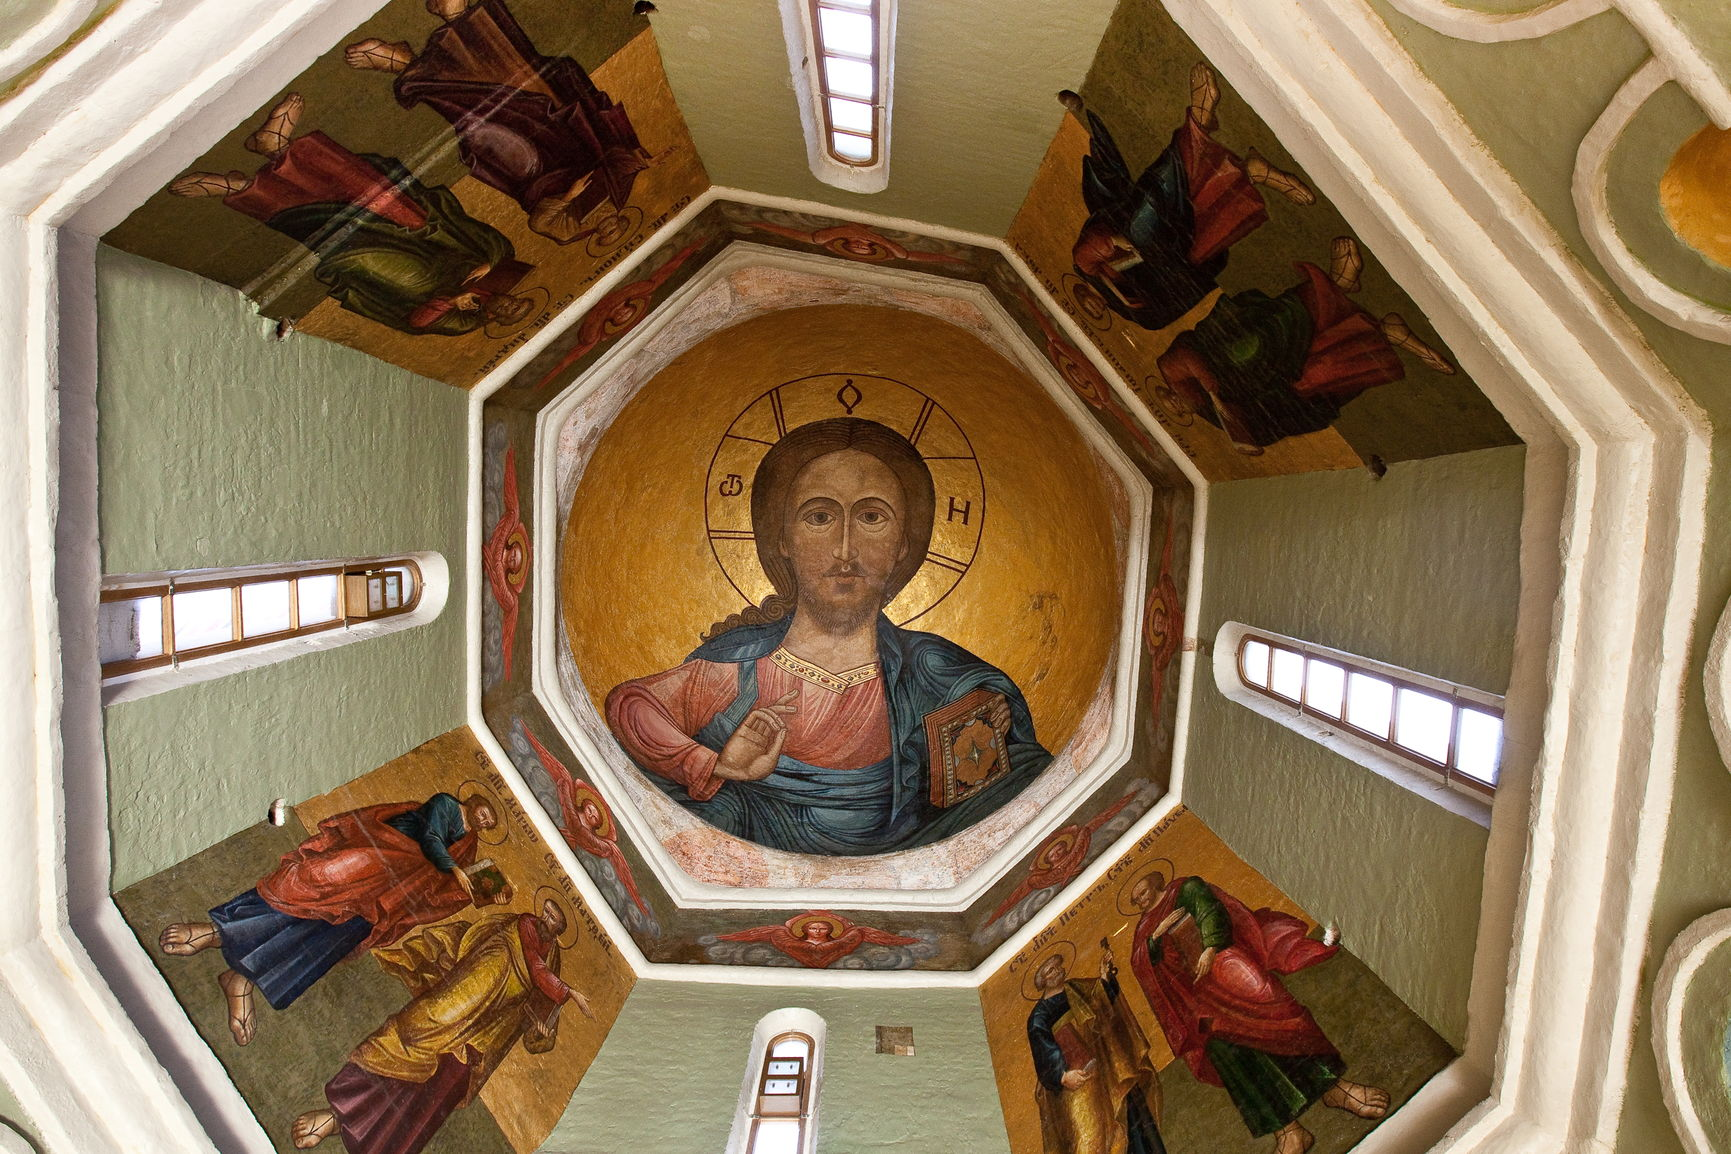 Христос Пантократор. Роспись на своде церкви